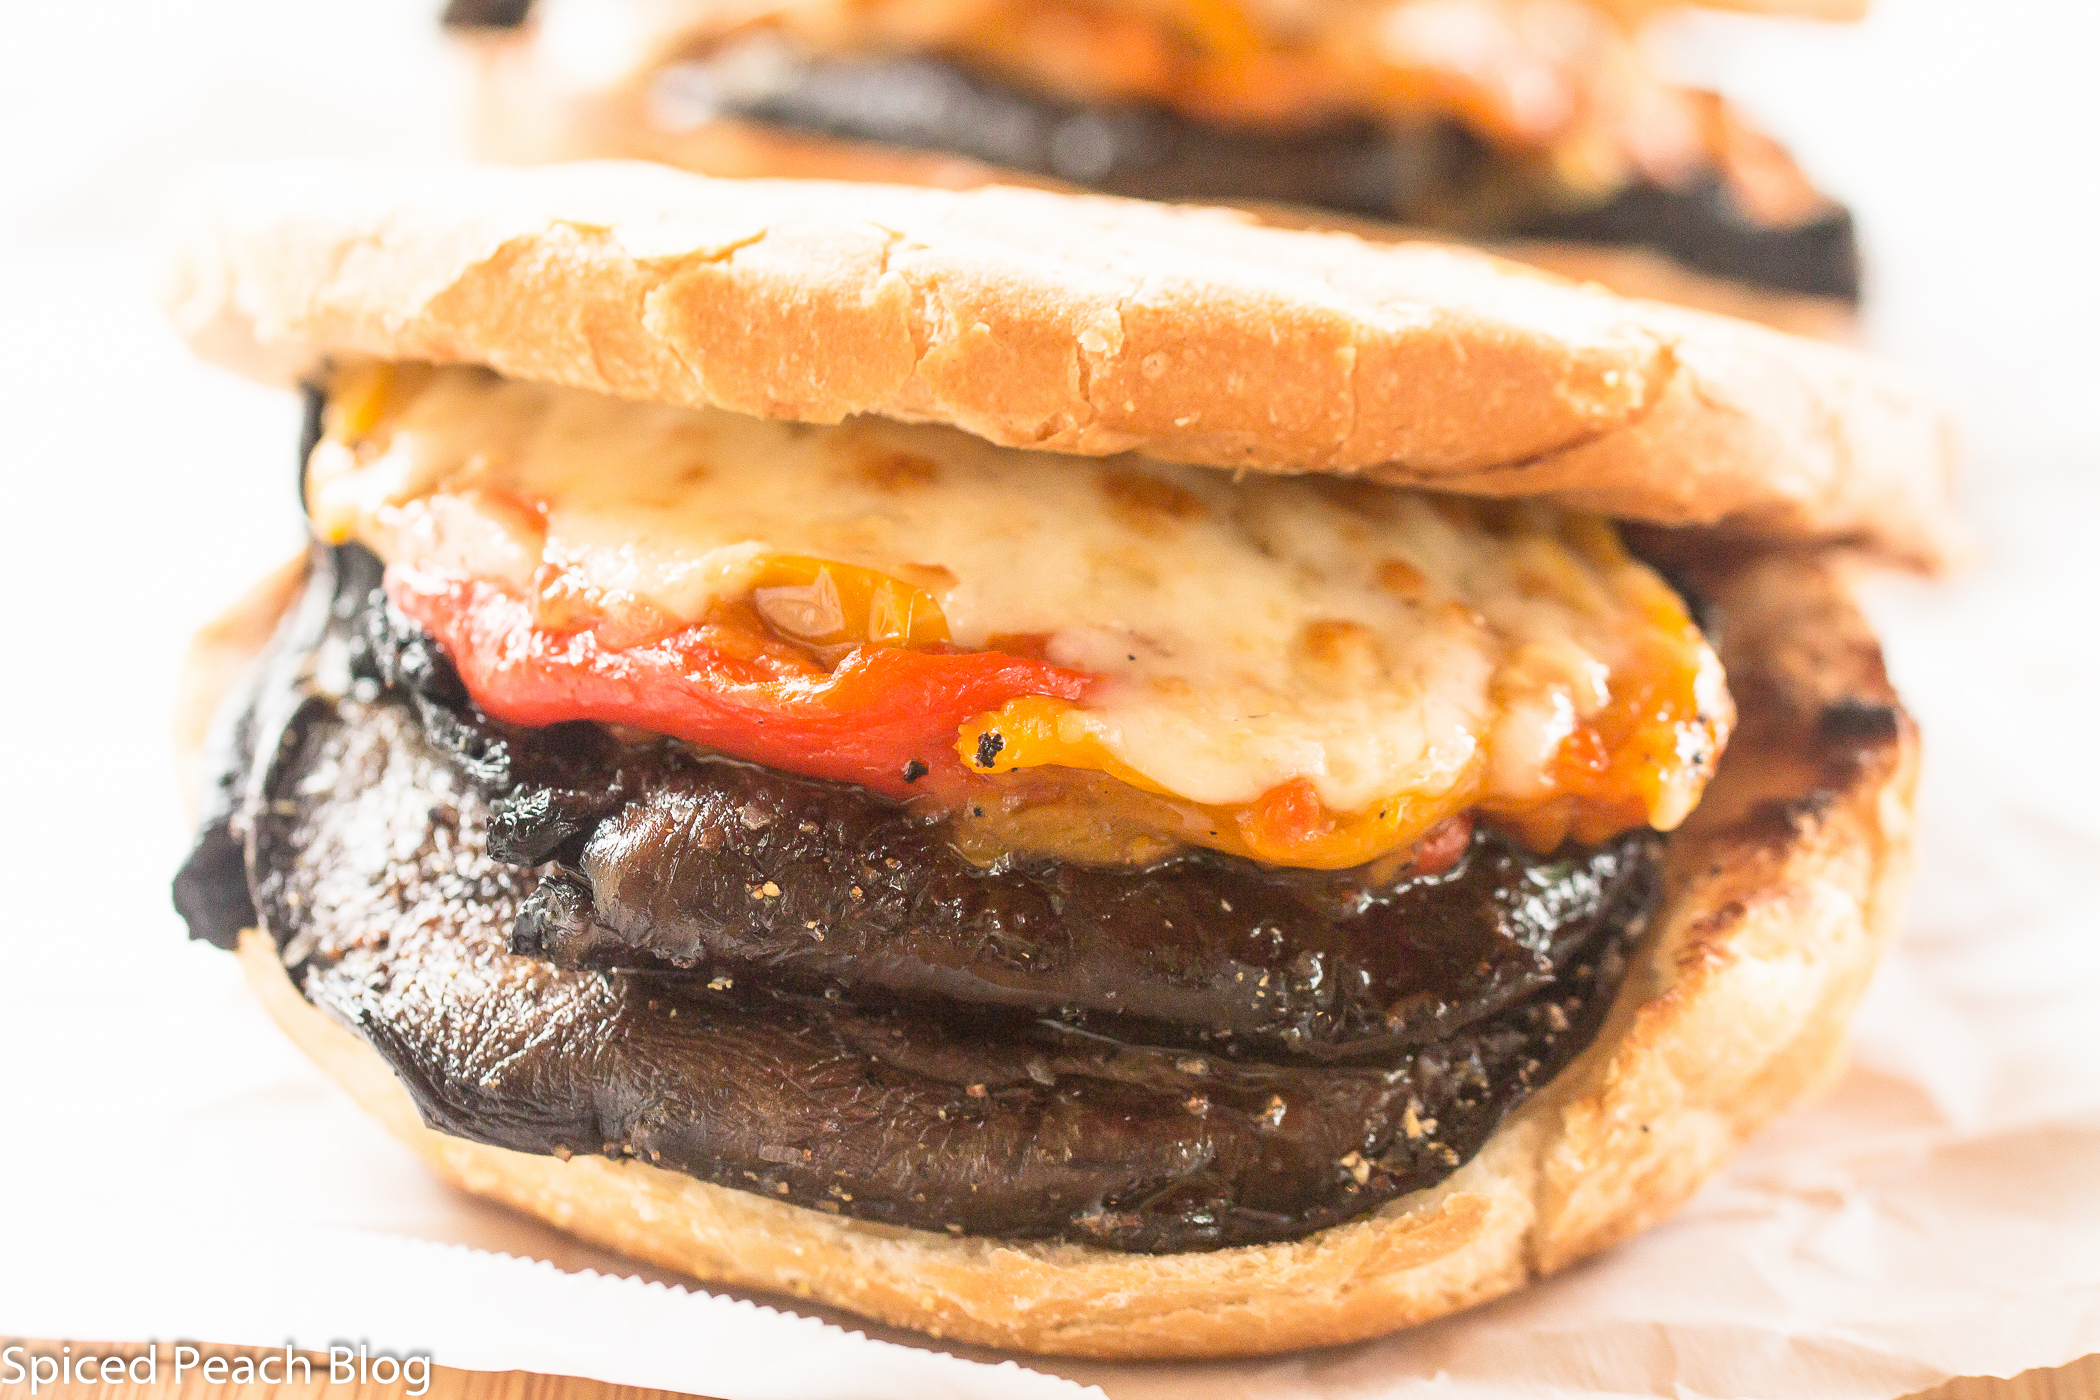 Grilled Portobello Mushrooms on Roll, Roasted Peppers, Vidalia Onion, Smoked Cheddar